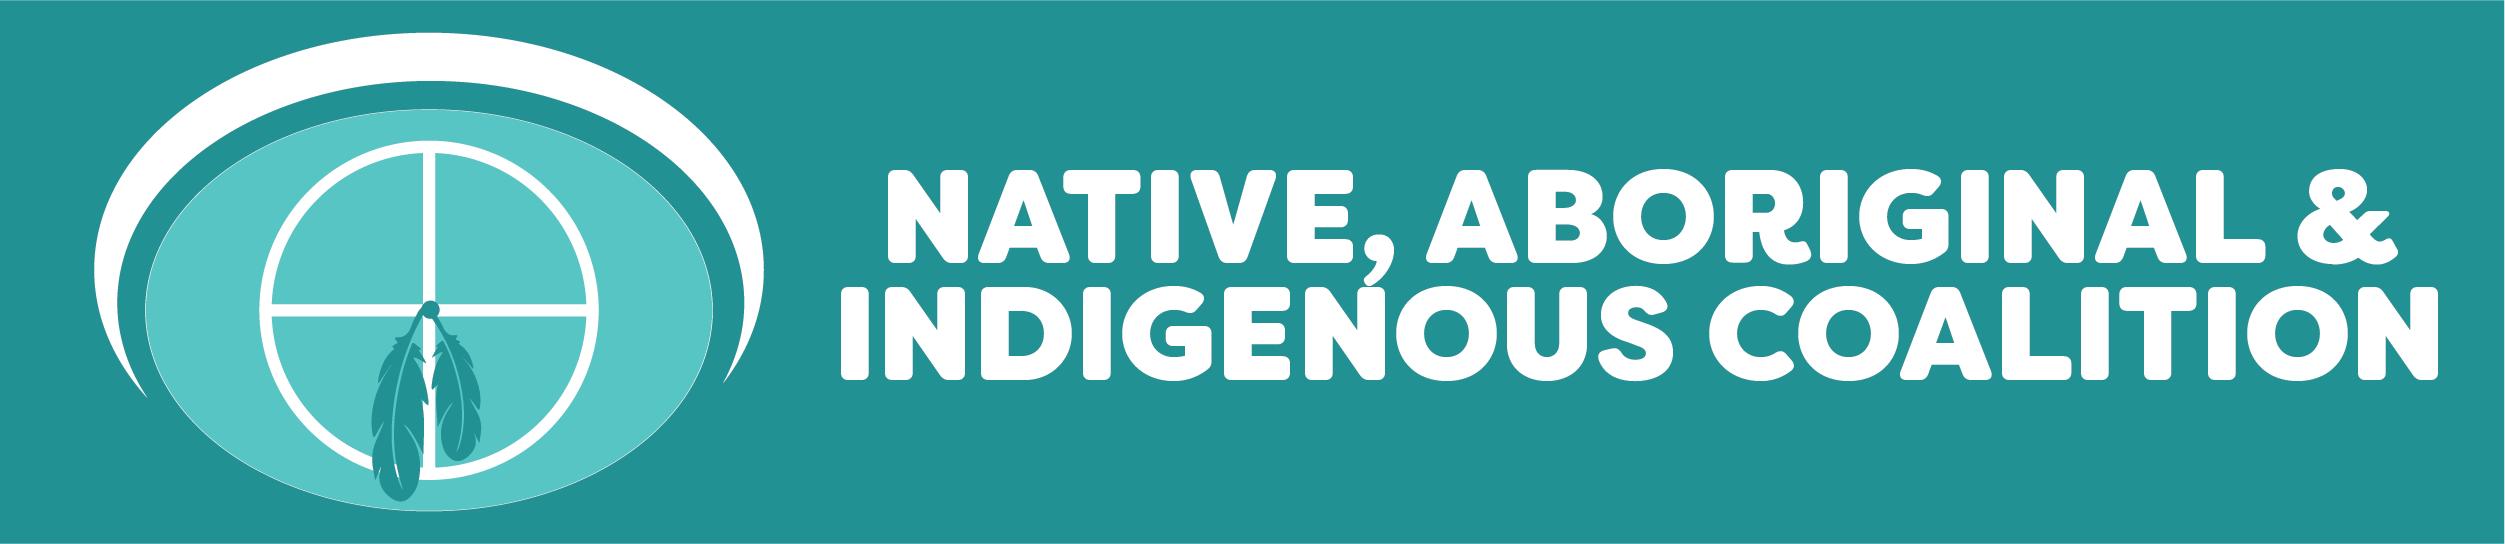 native, aboriginal and indigenous coalition